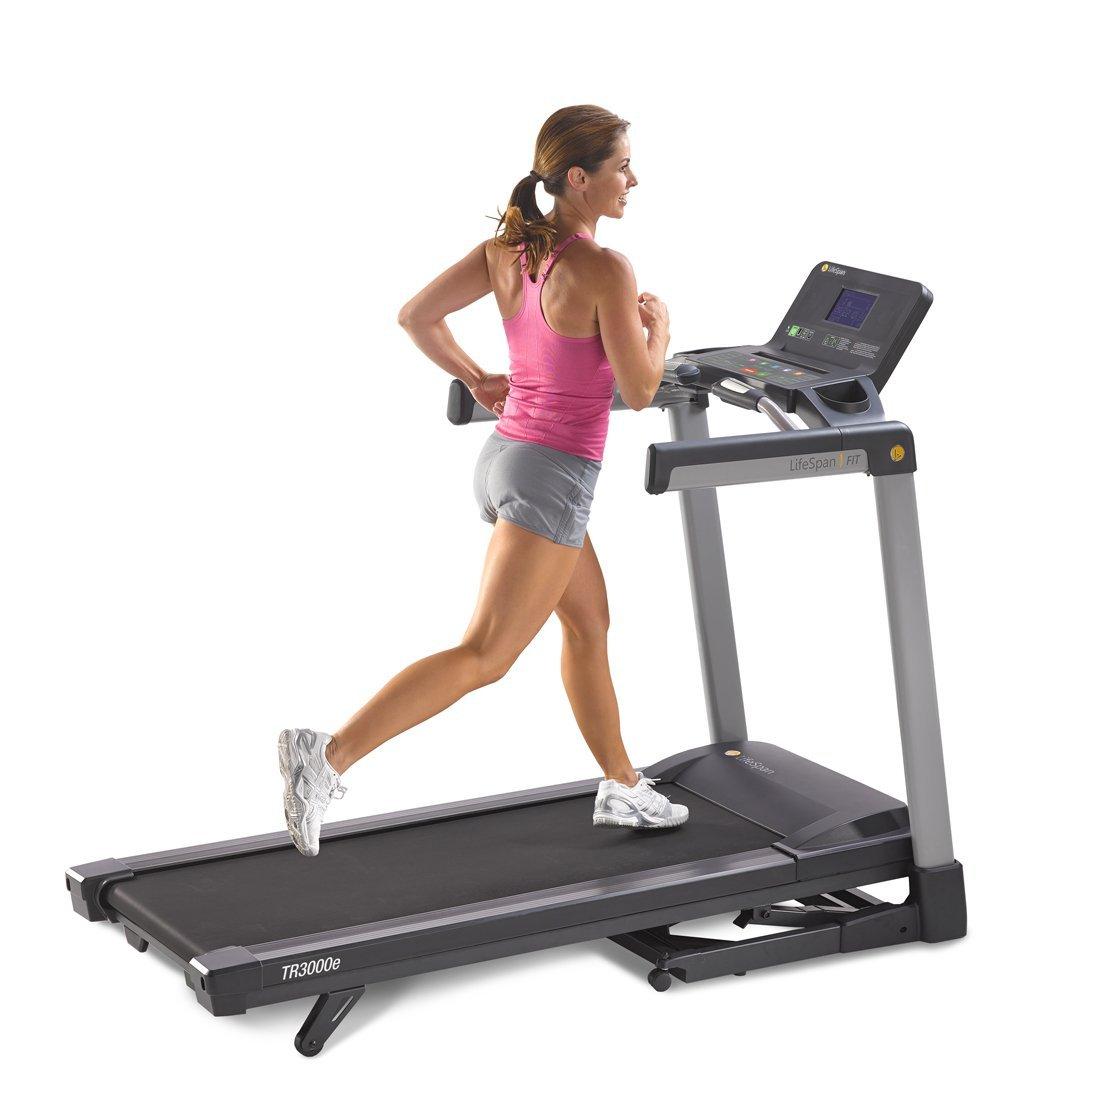 Lifespan TR3000 Treadmill